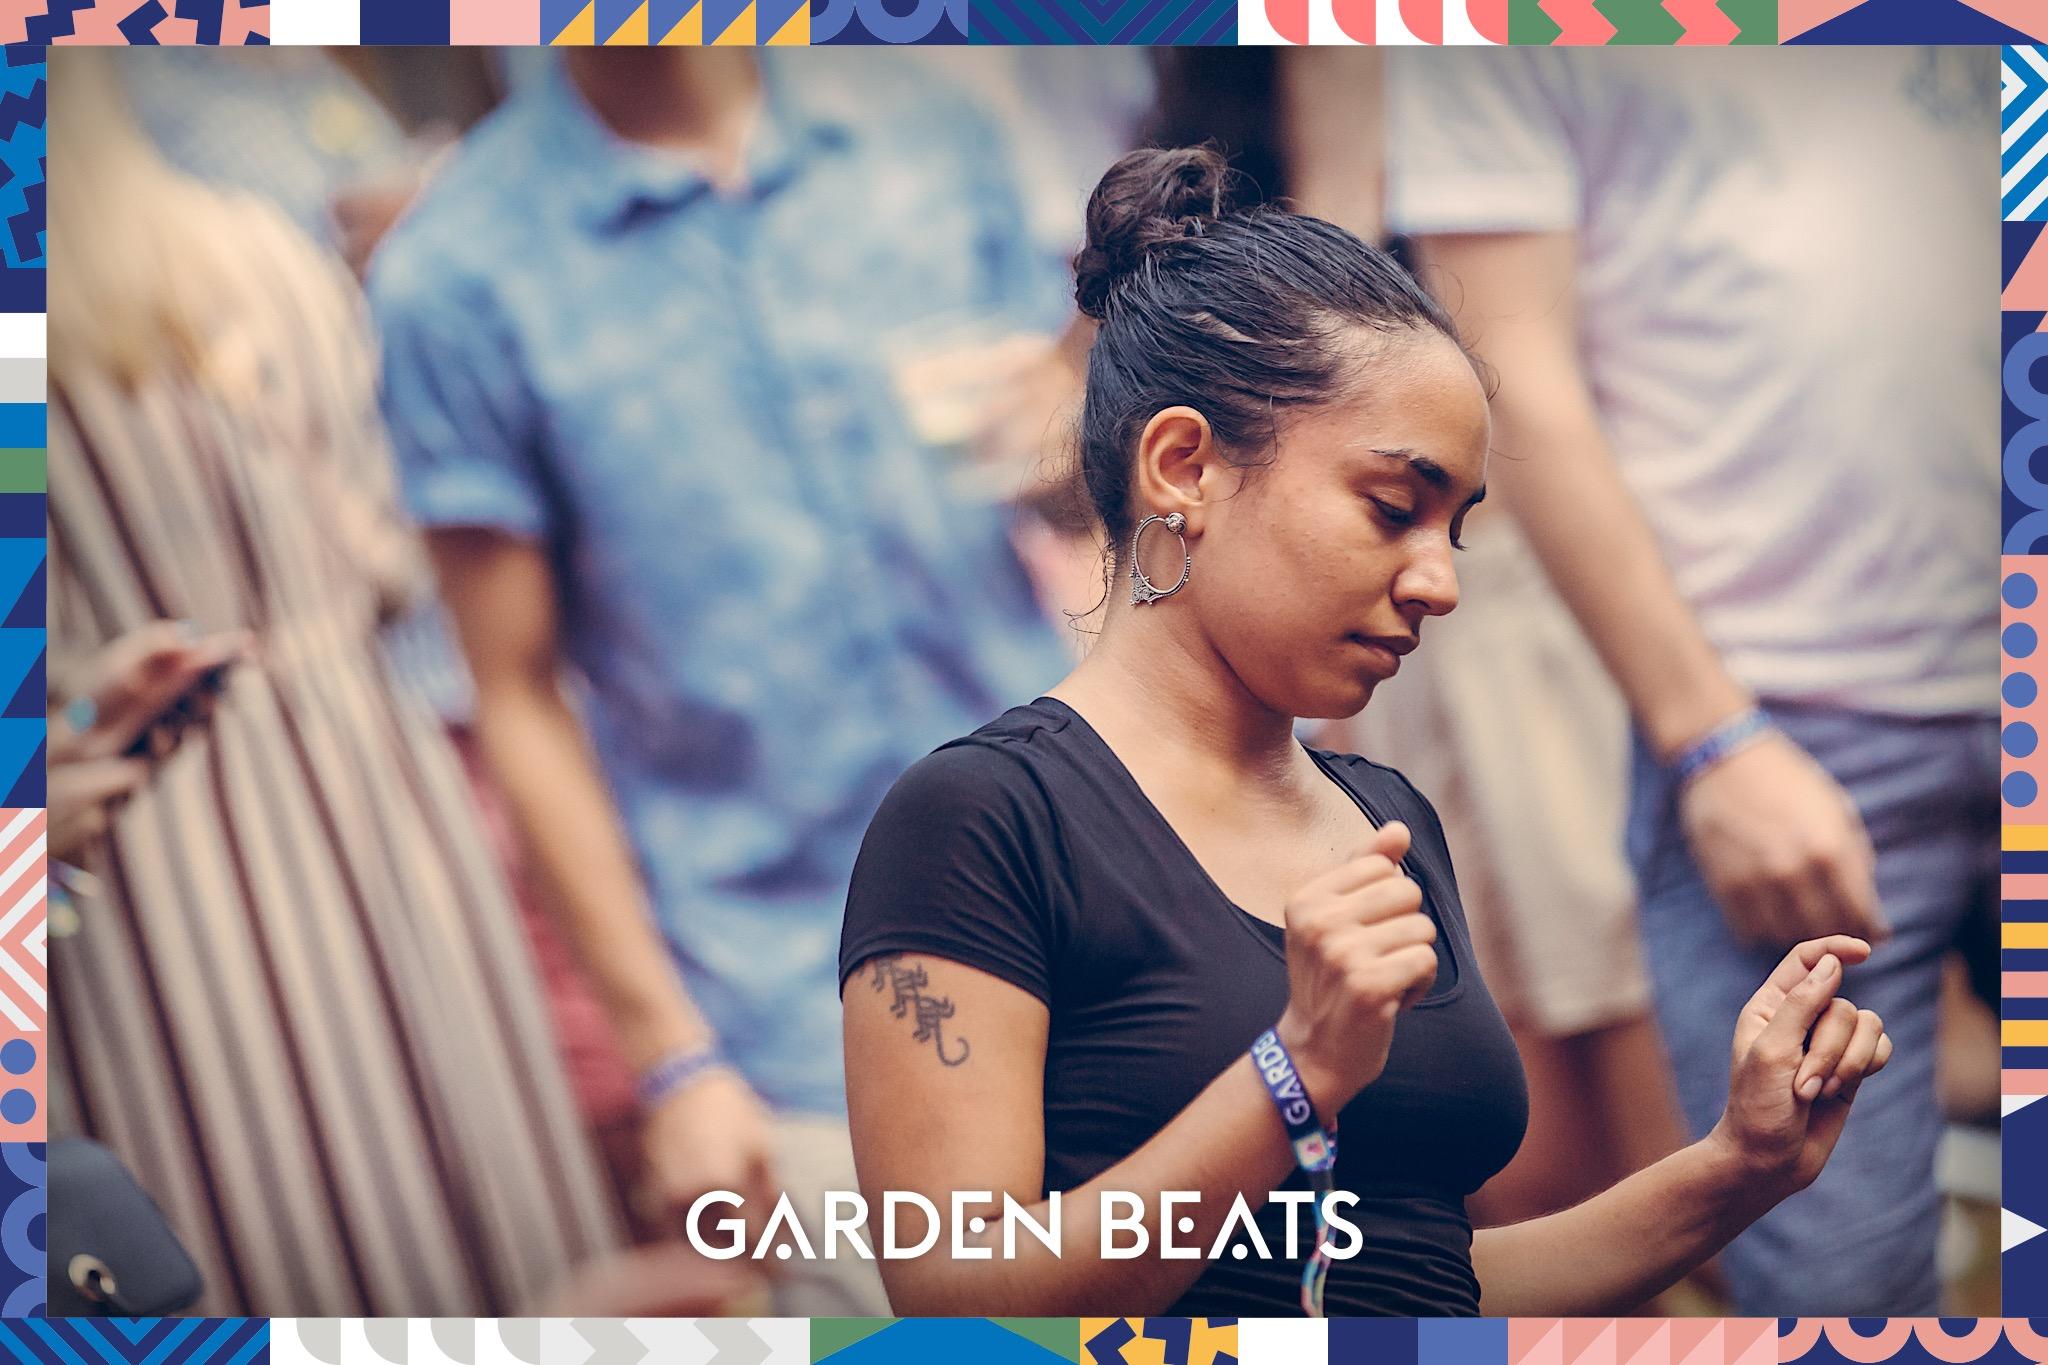 03032018_GardenBeats_Colossal601_Watermarked.jpg